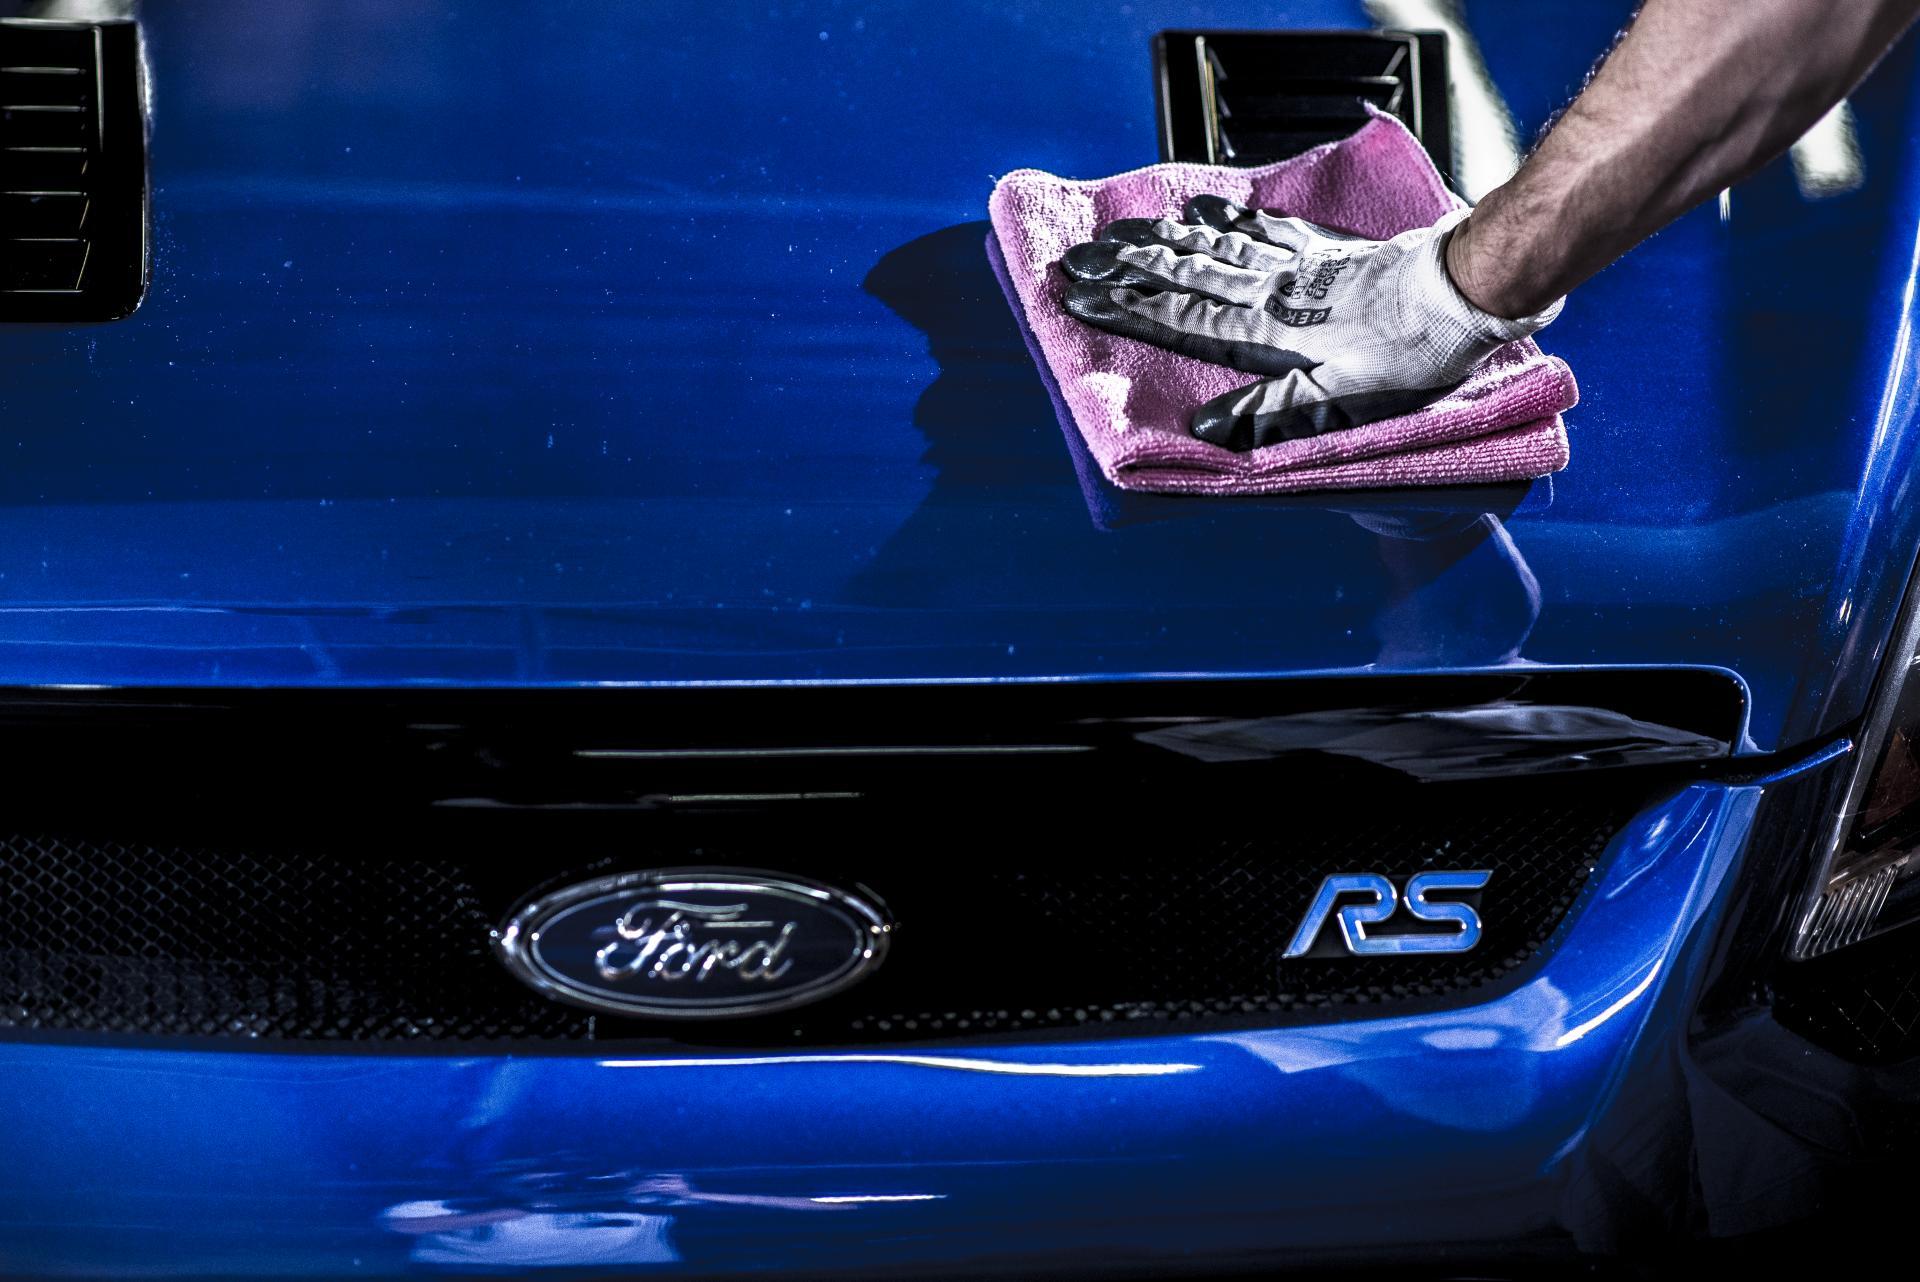 Ford Focus II RS polerowanie